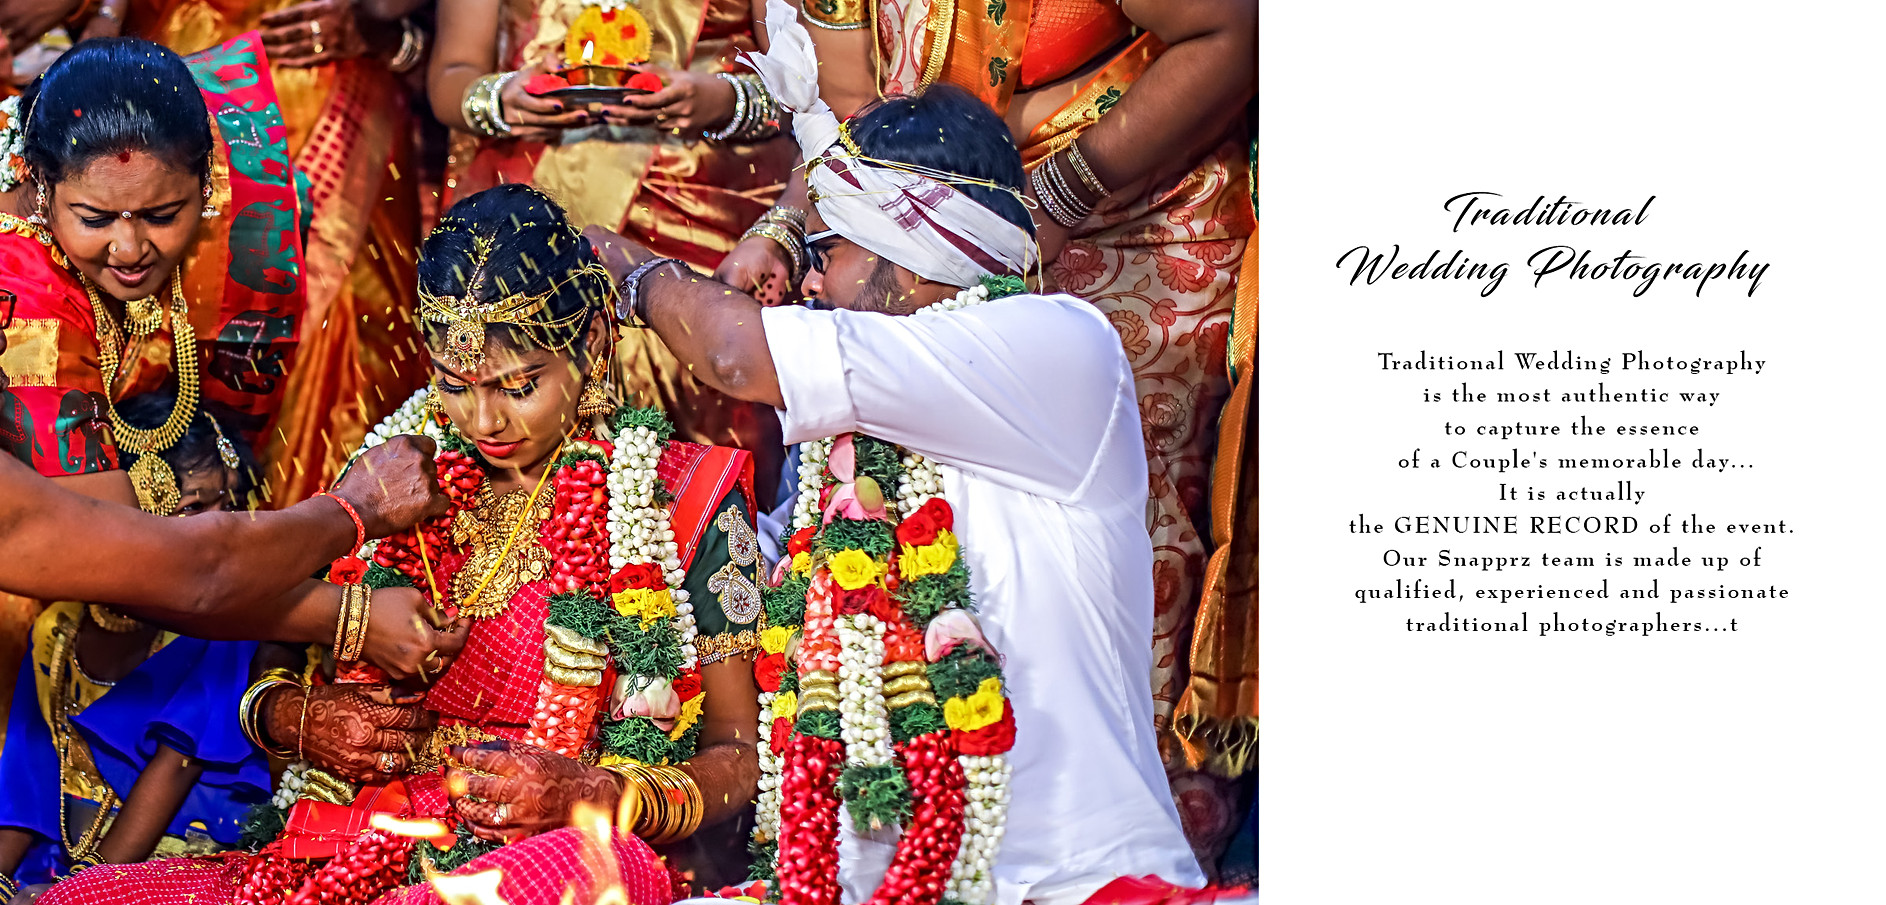 Traditional Wedding Photography.jpg